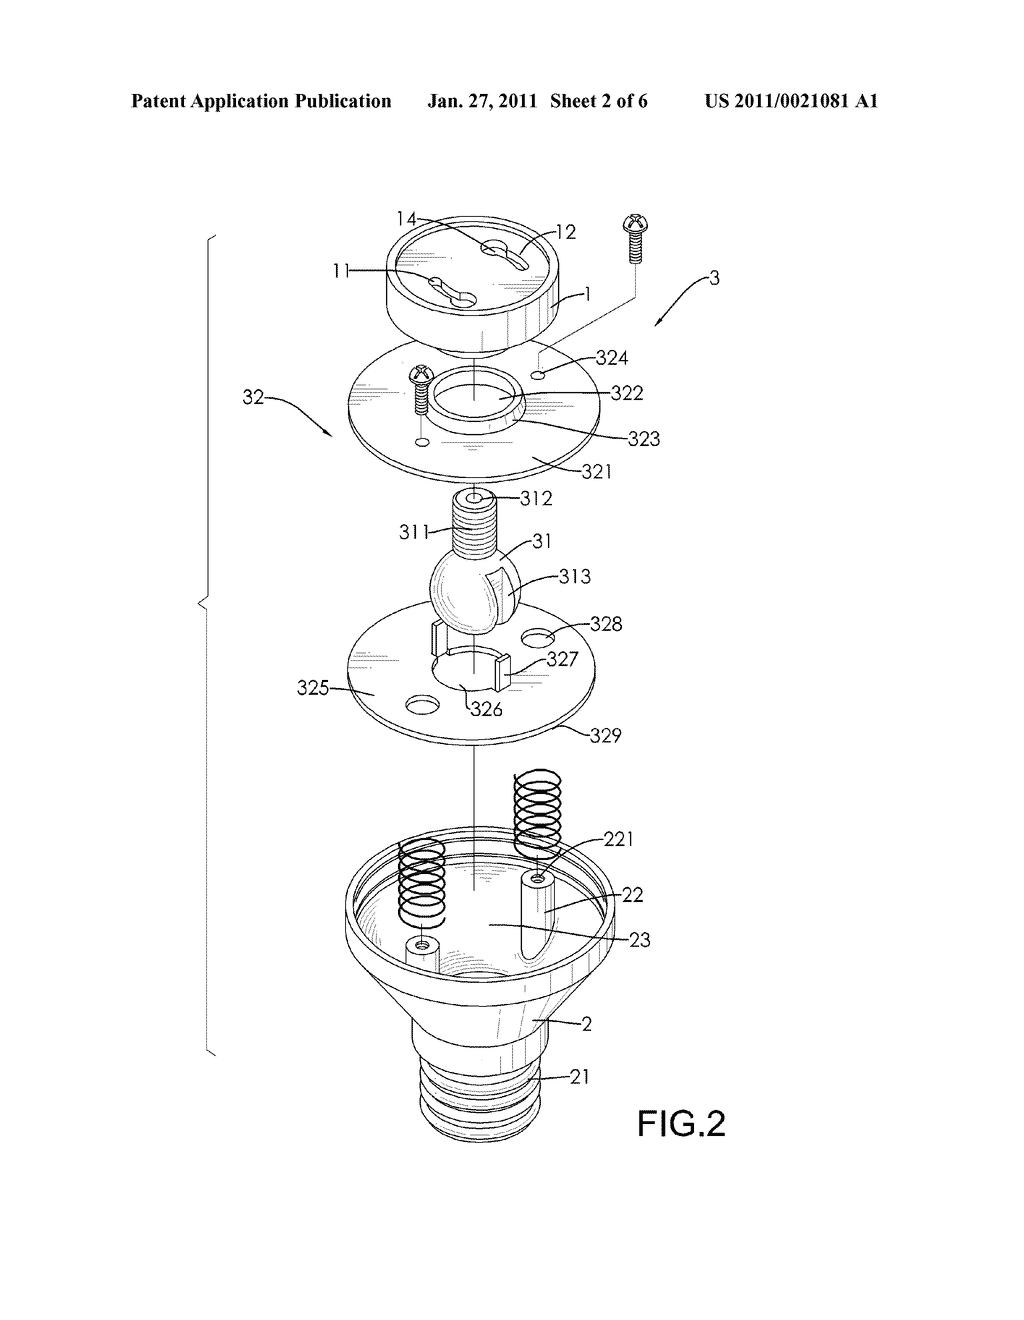 Pretty light socket diagram images electrical circuit diagram